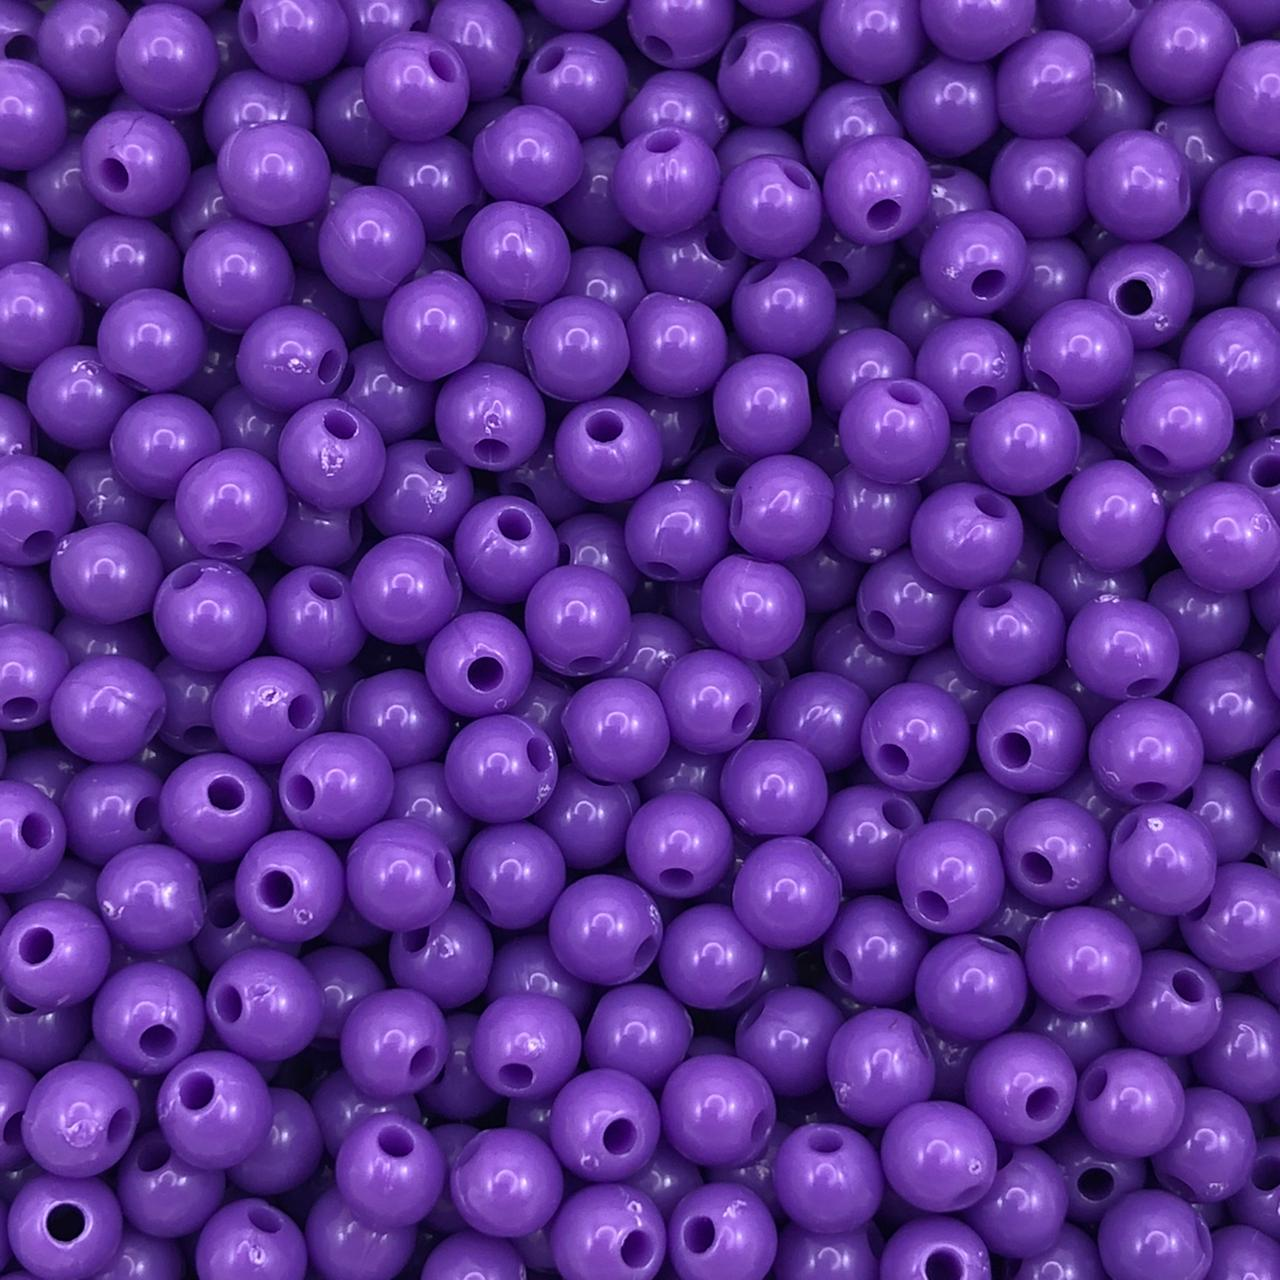 BOL590 - Bola Resina Violeta 5mm - 20Grs